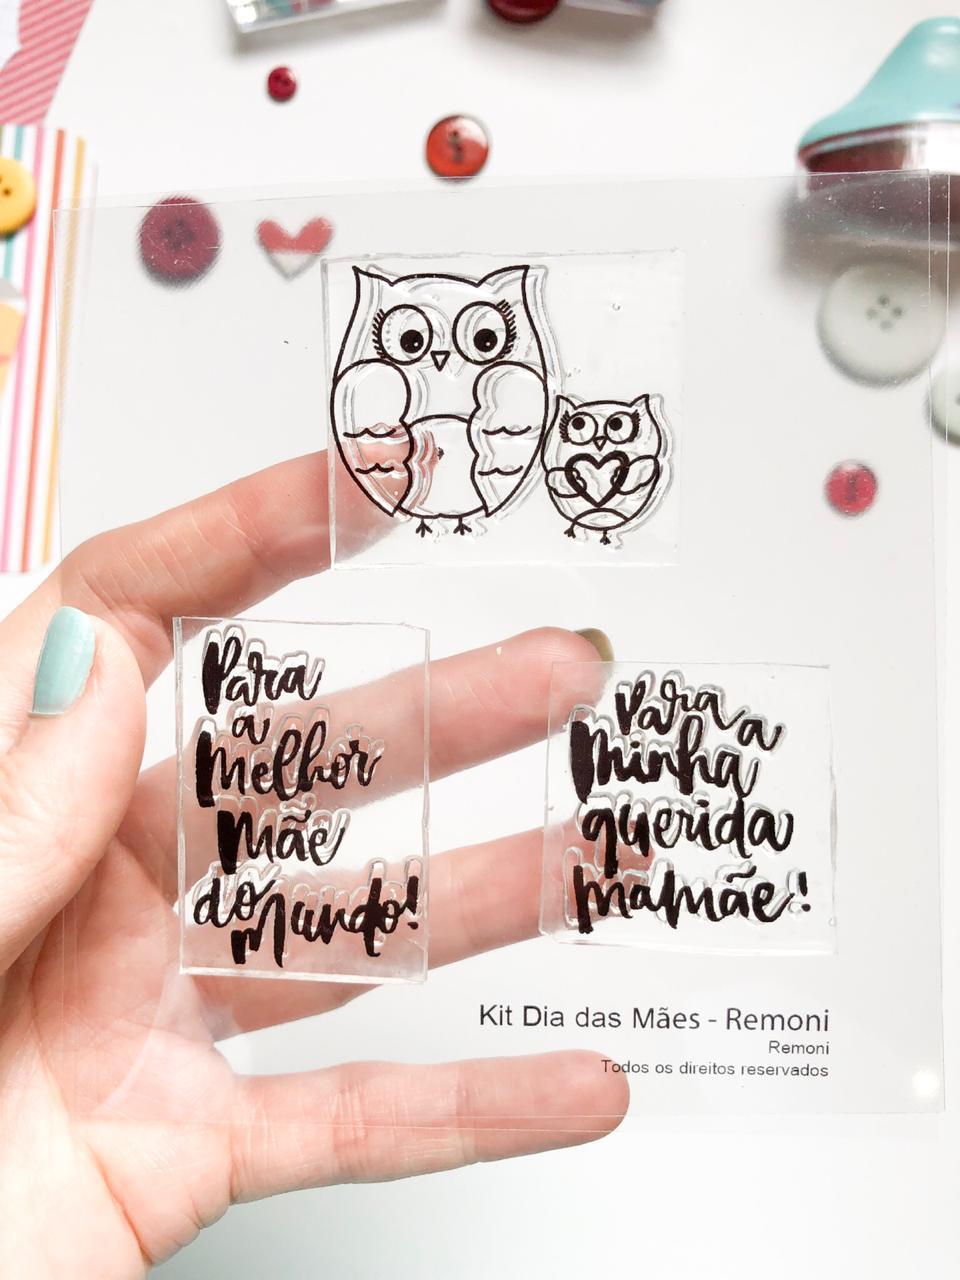 Kit de Carimbos - Dia das Mães  - Remoni